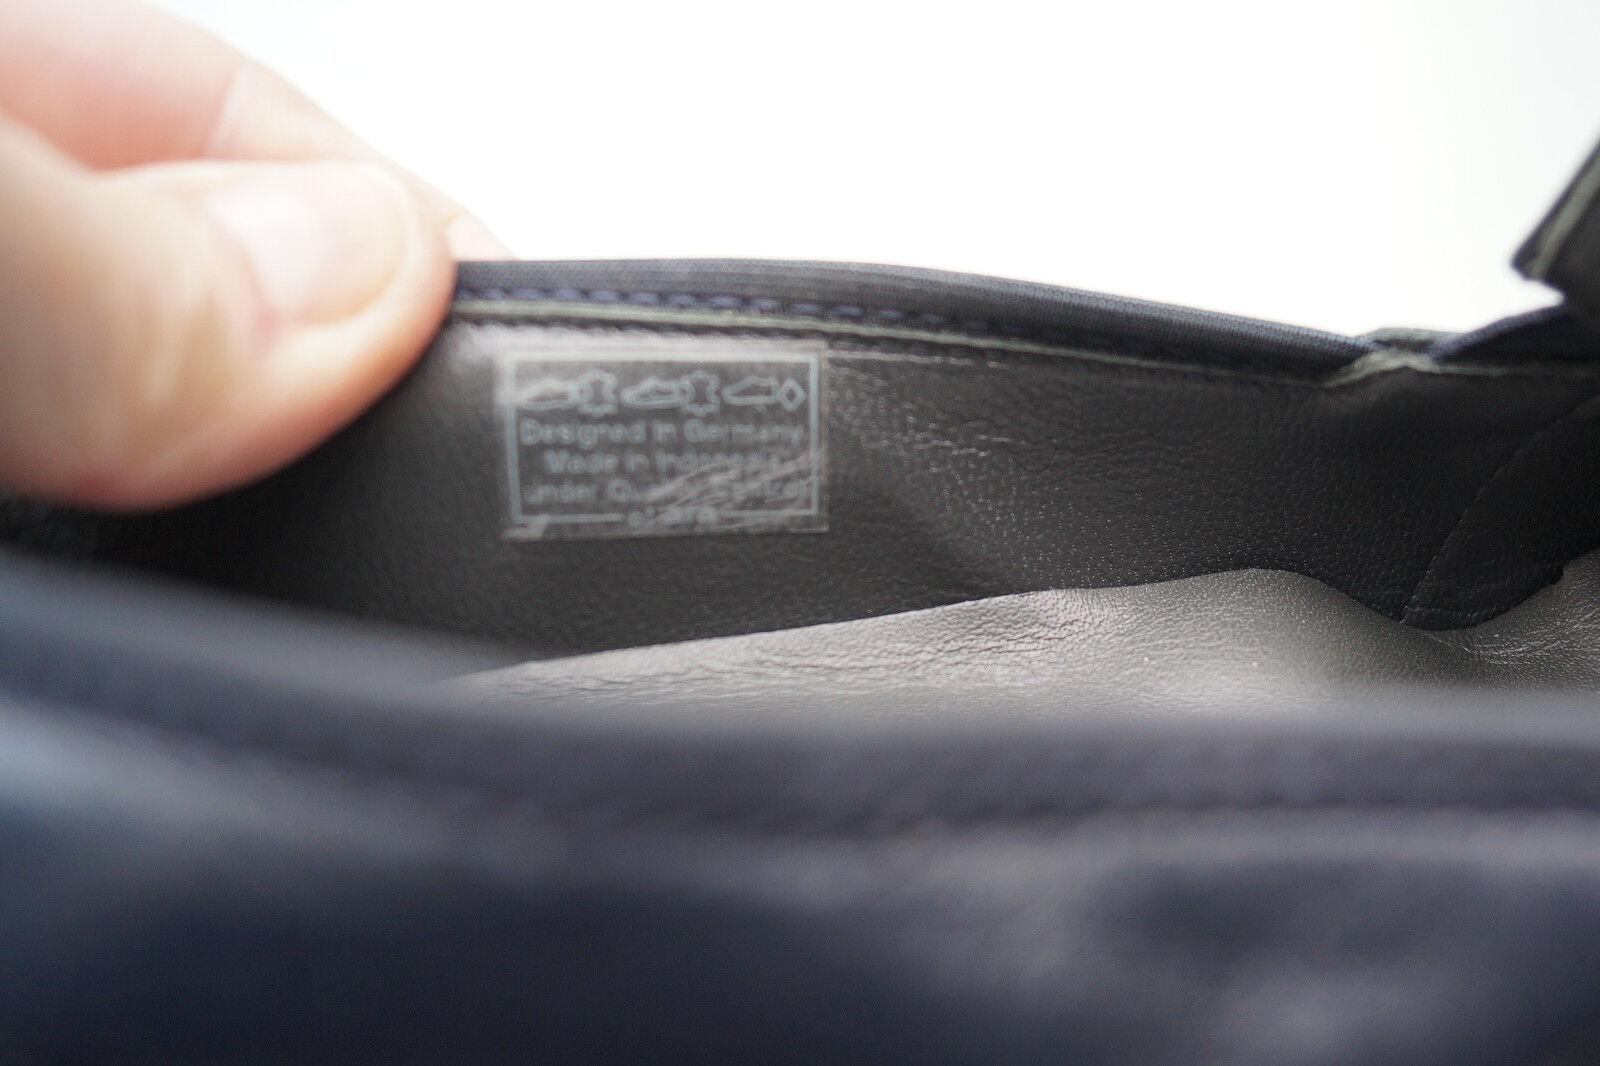 ARA ARA ARA Damen Comfort Schuh Slipper Pumps Leder marine Einlagen Gr.6 H 39,5 NEU +3 cbbca7